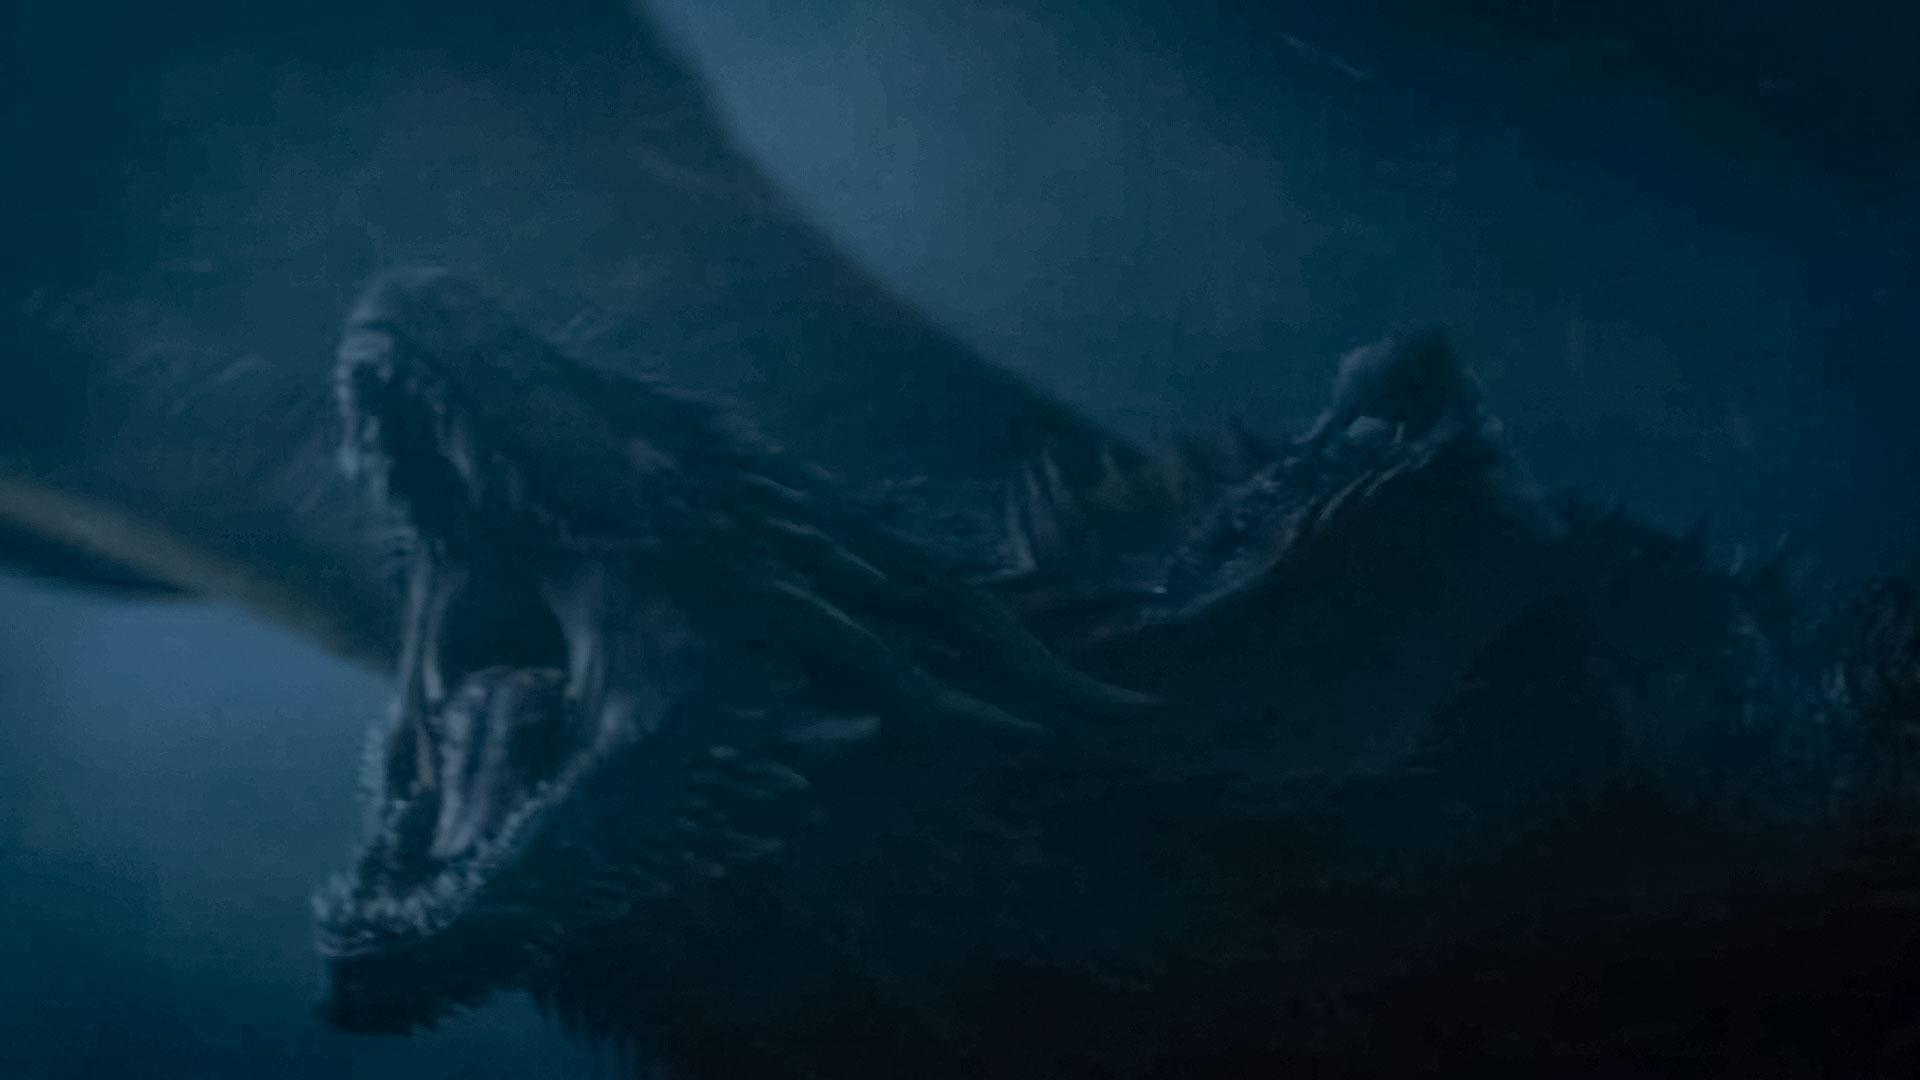 قسمت ۳ فصل ۸ گیم آف ترونز (Game Of Thrones)